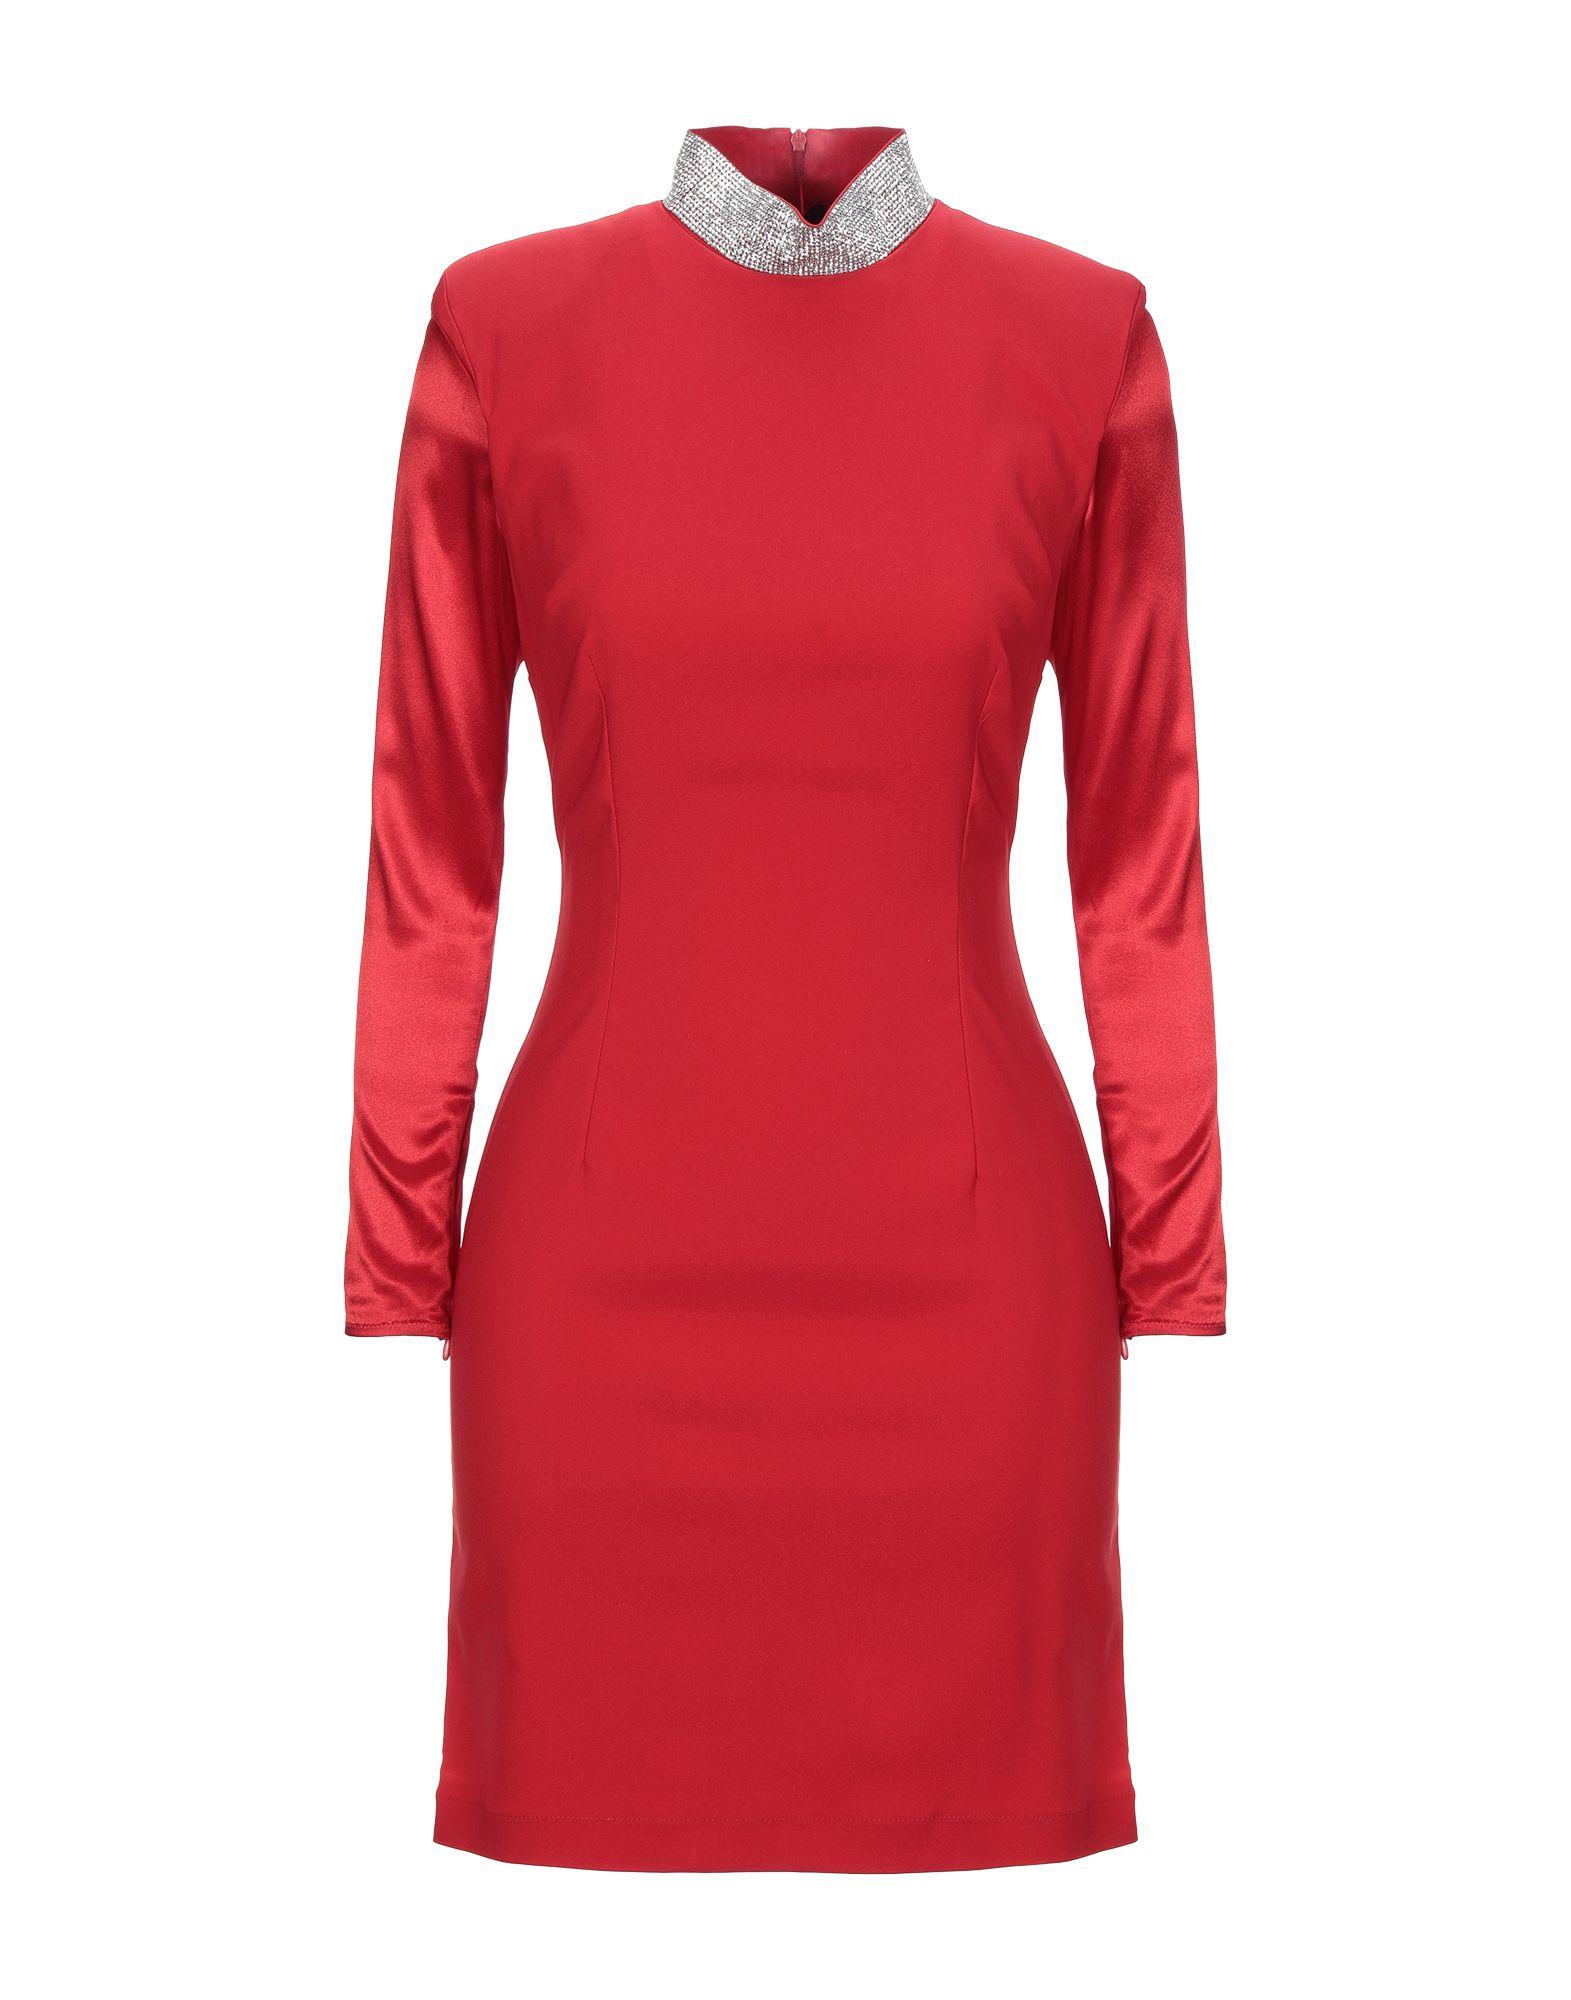 Фото - DORIS S Короткое платье doris s короткое платье